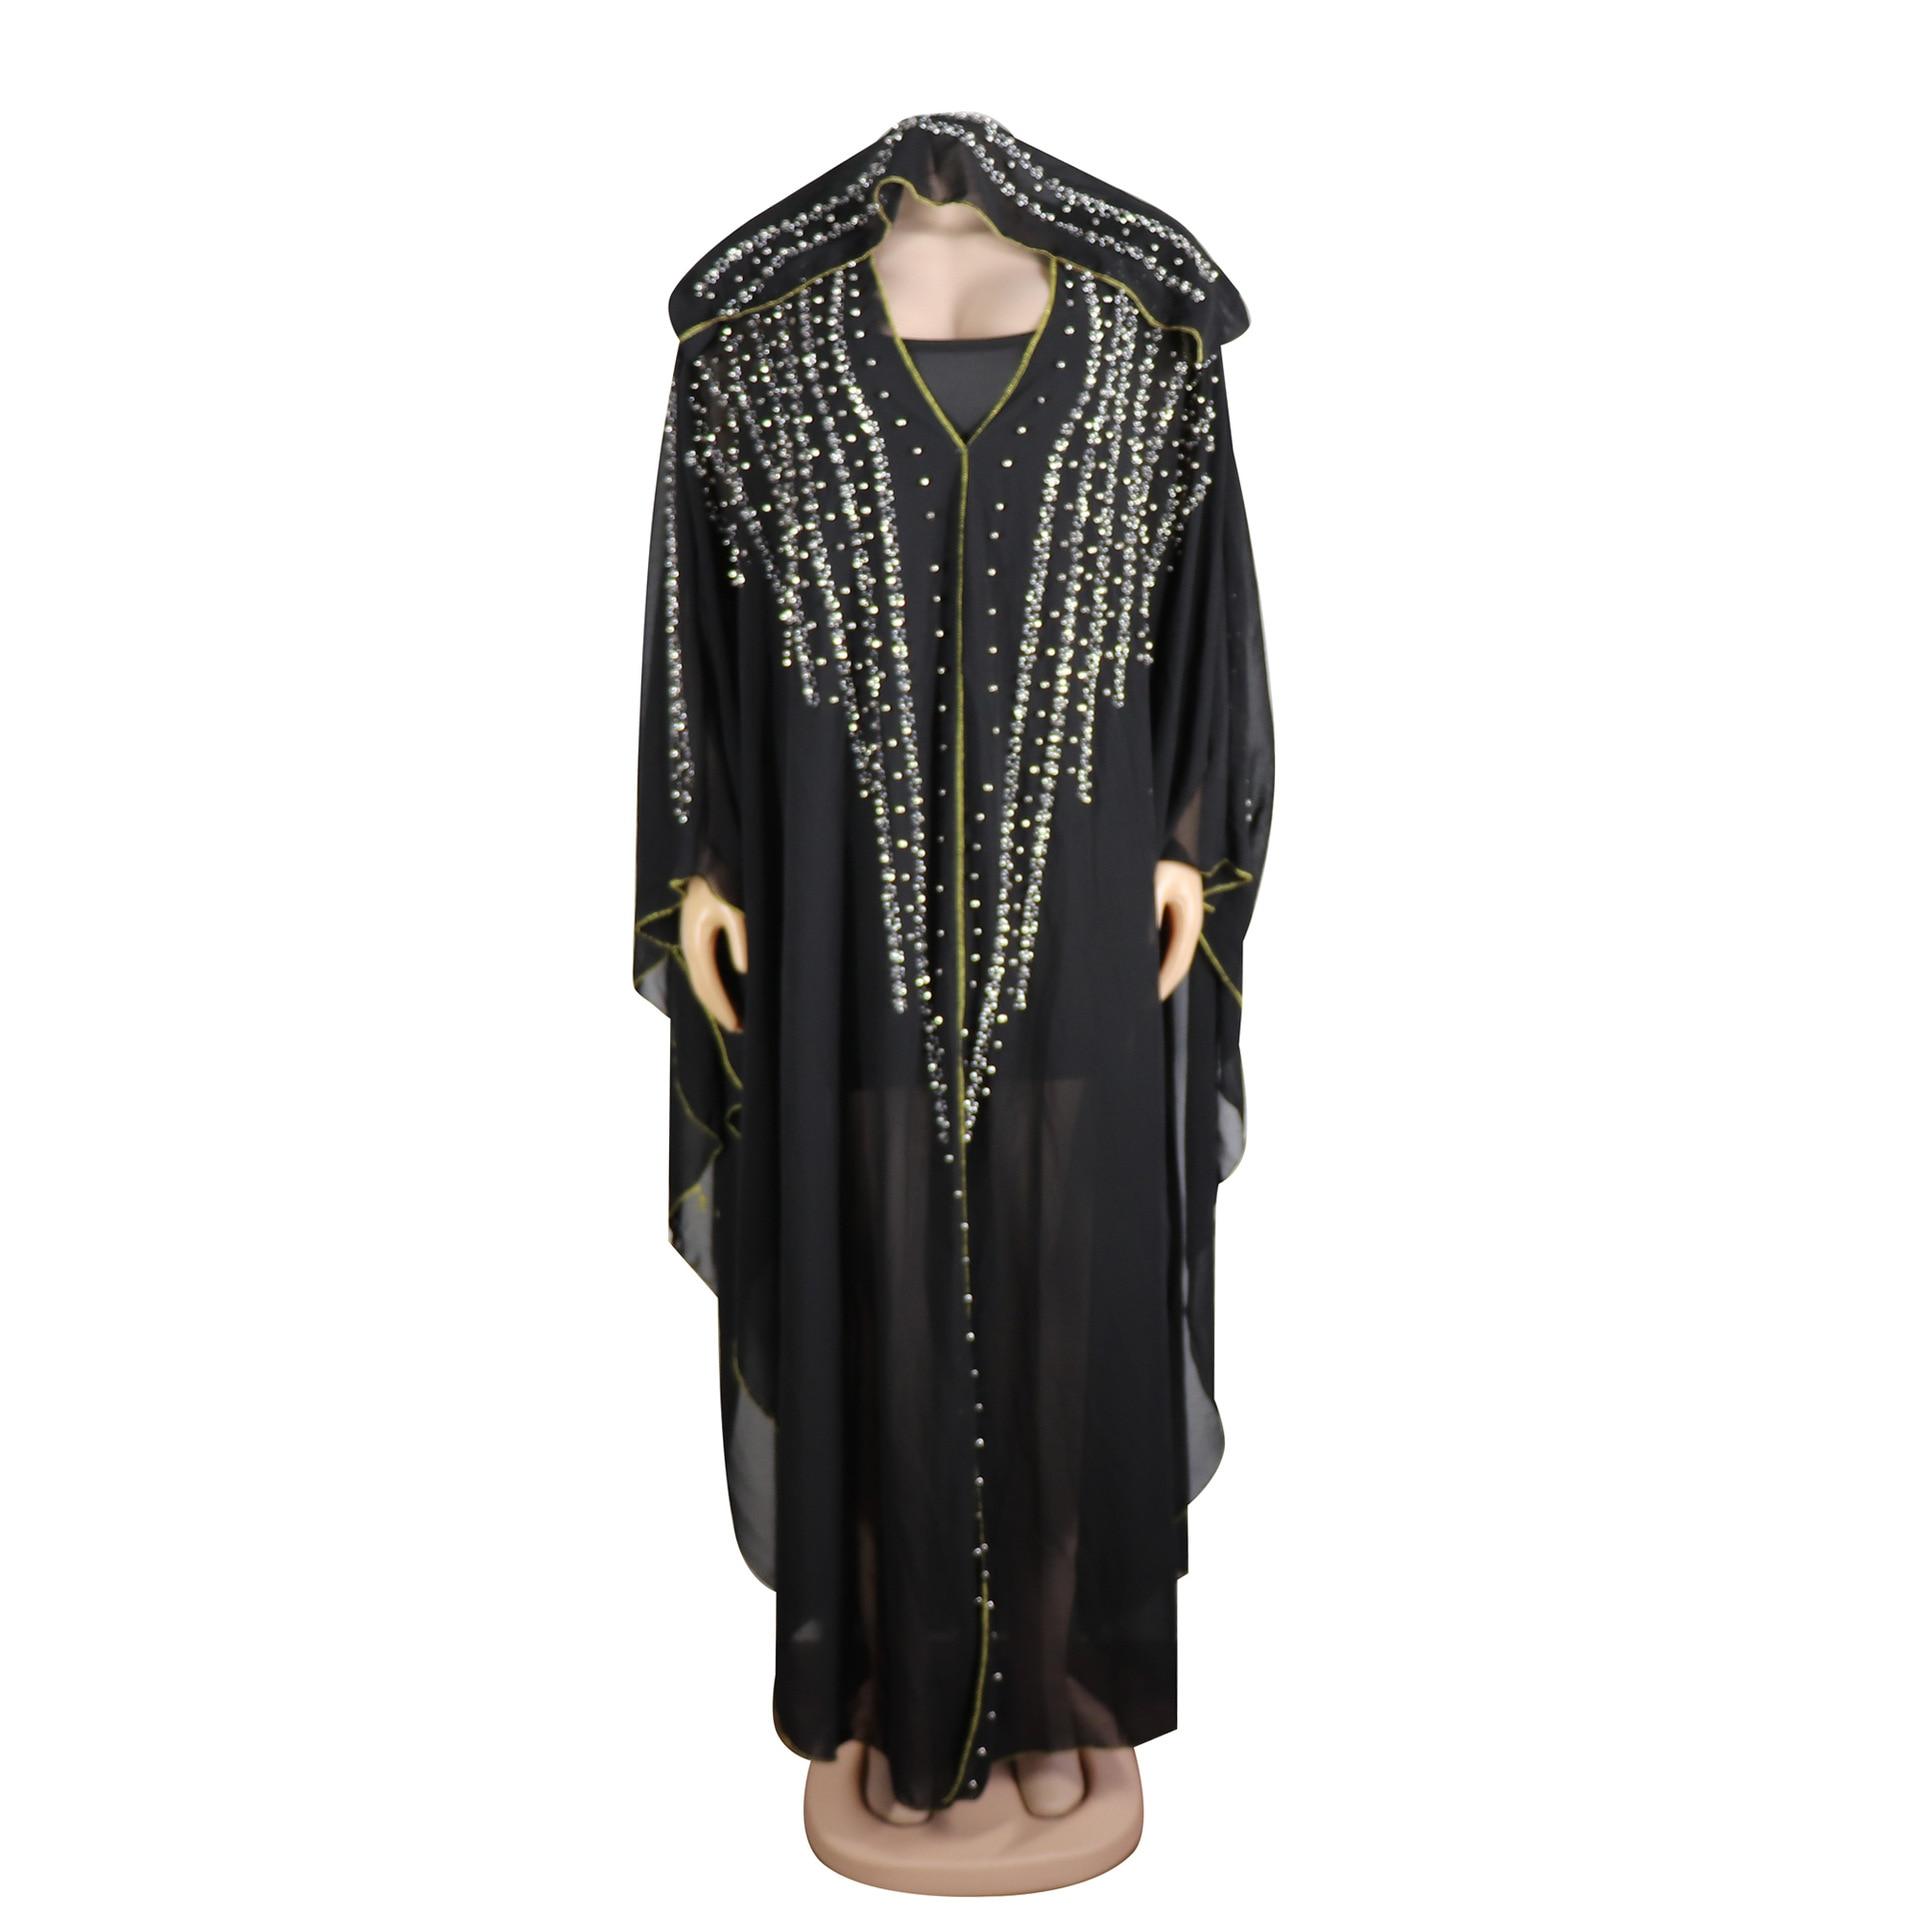 African Dresses For Women Beading Robes Long Maxi Dresses Fashion Plus Size Chiffon Dress Hooded Black Abaya Batwing Vestidos 7